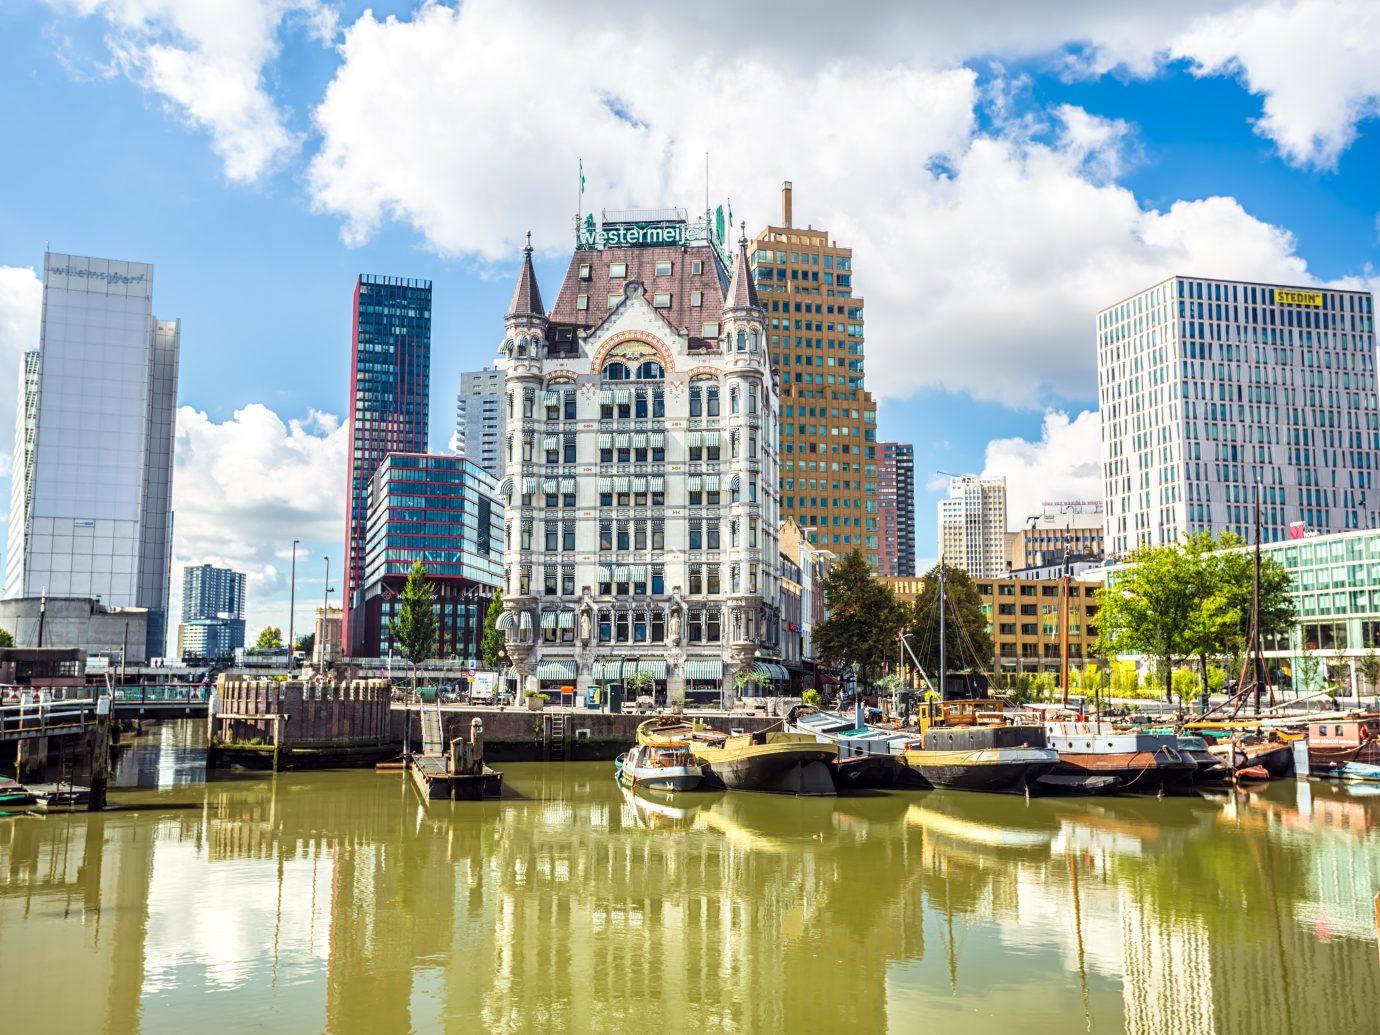 Rotterdam city center with harbor